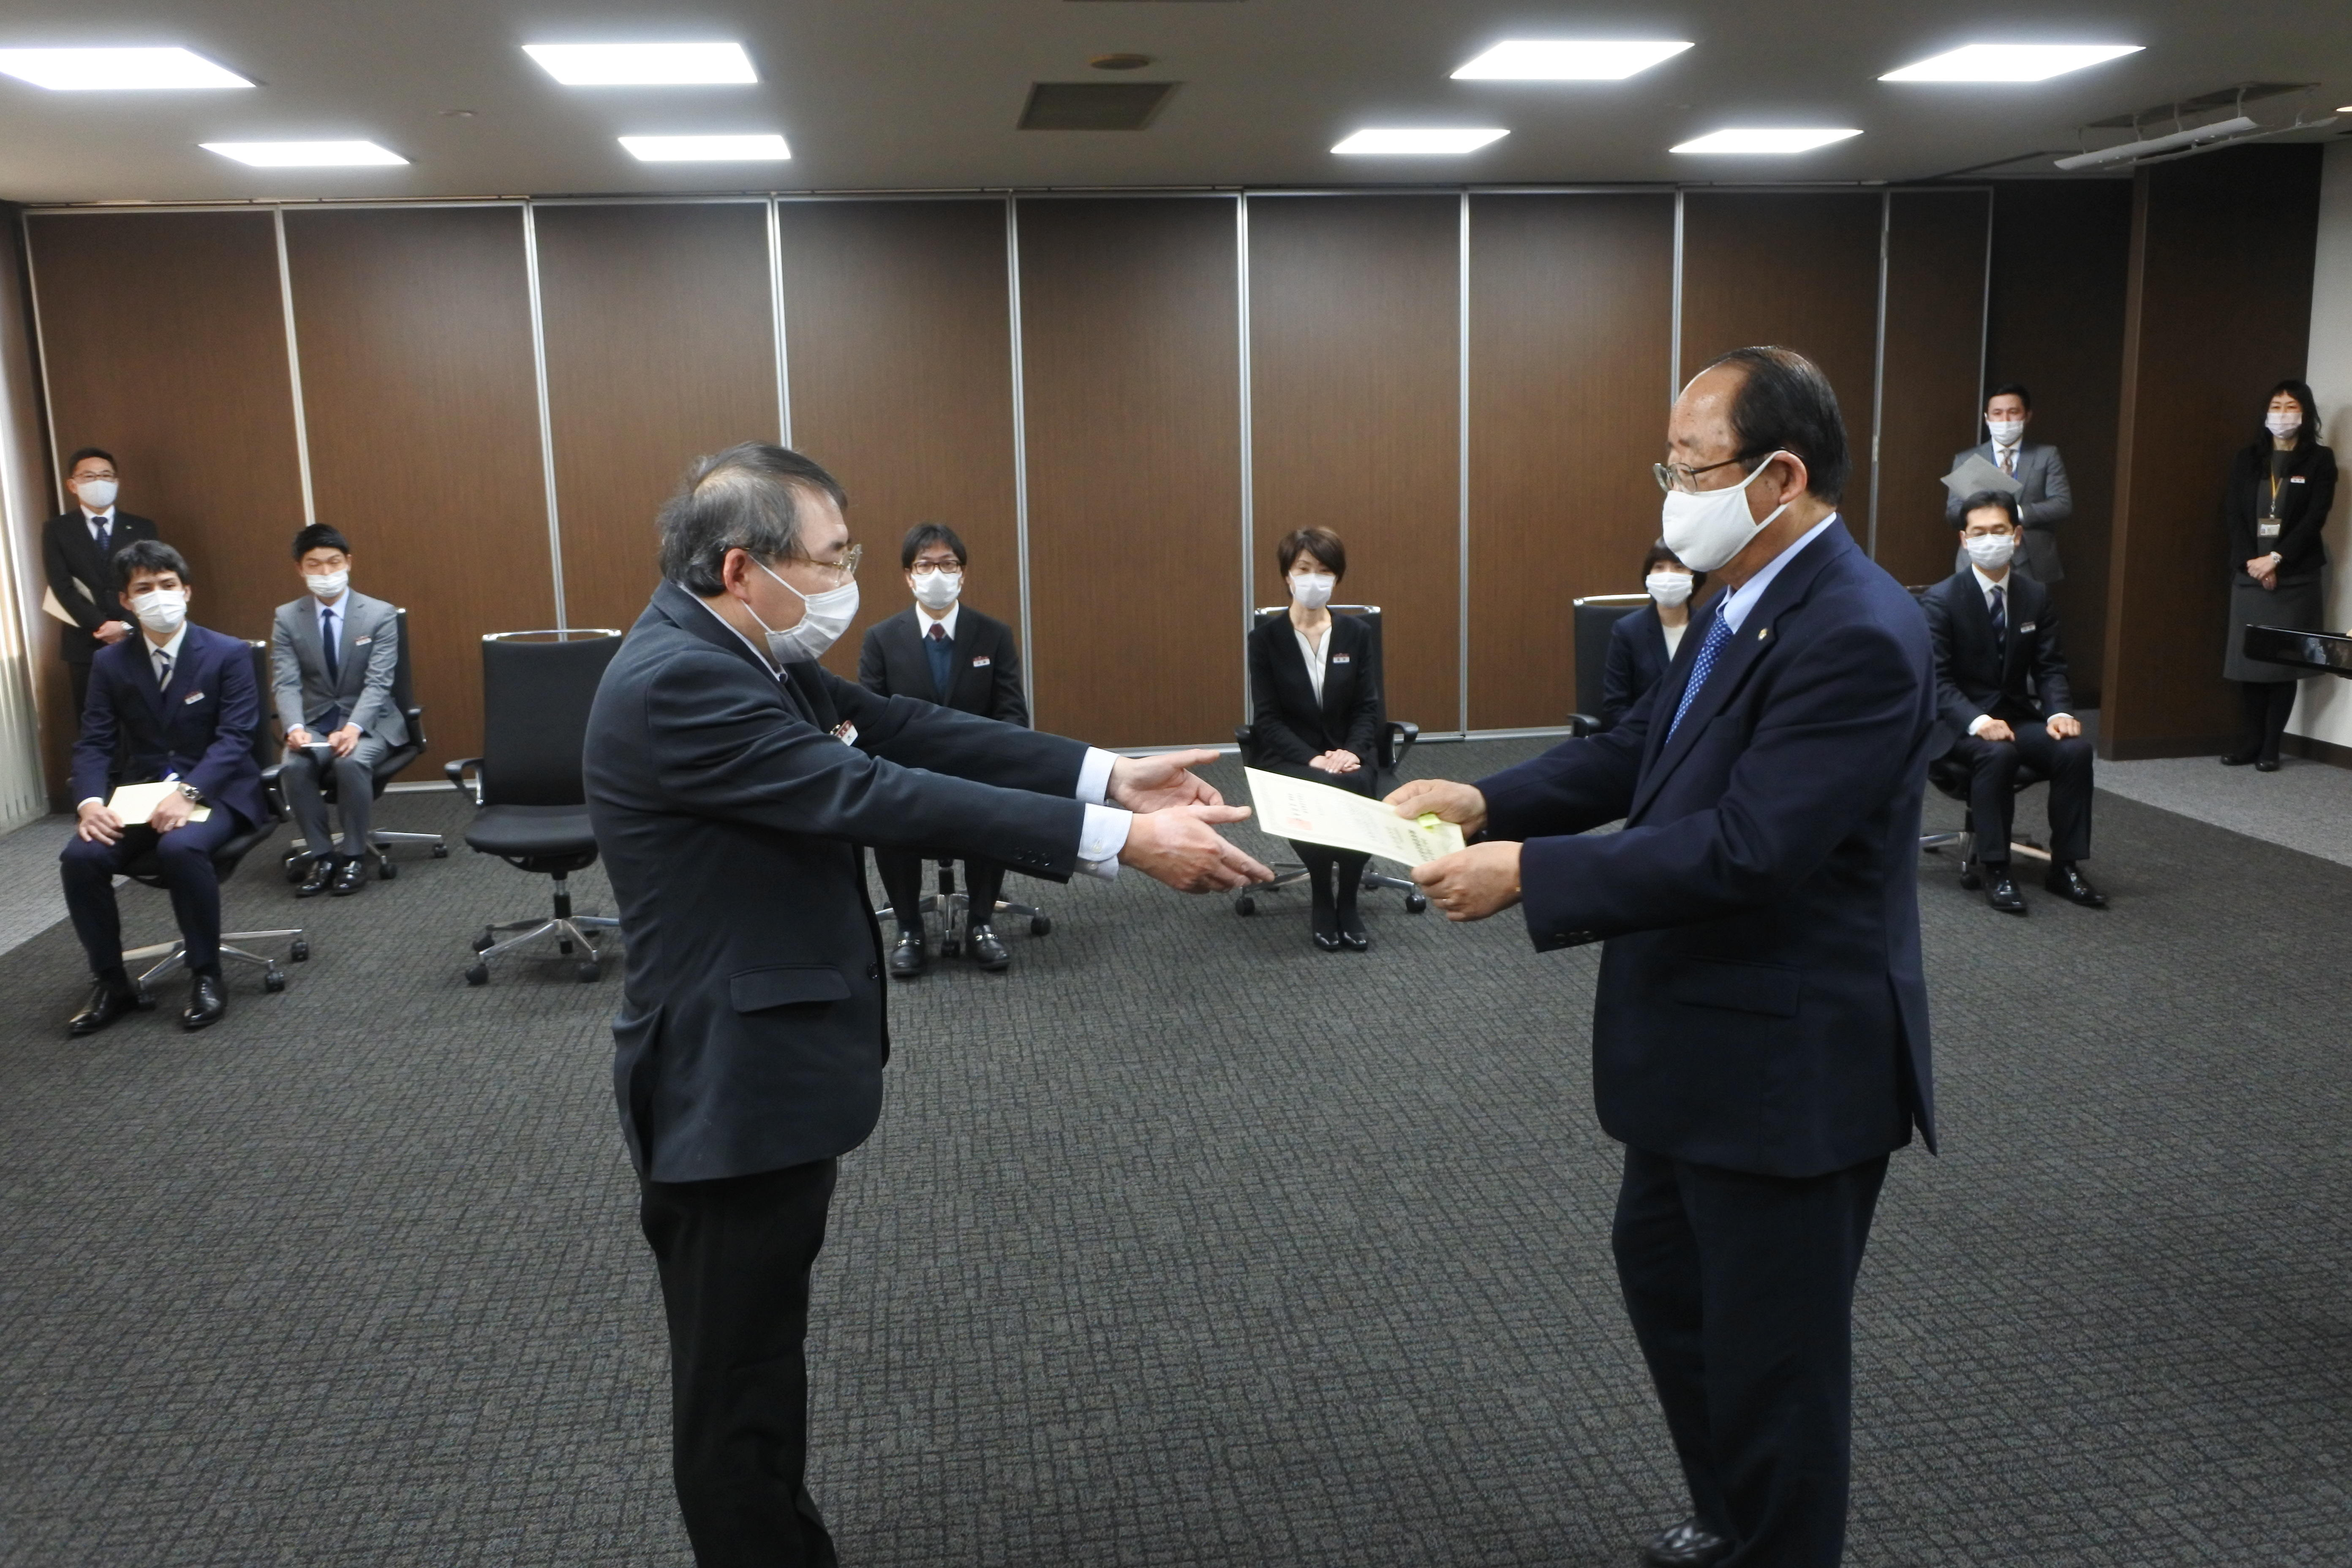 立花貞司理事長(手前右)から表彰状を受け取る鈴木厚司外国語学部事務室事務長